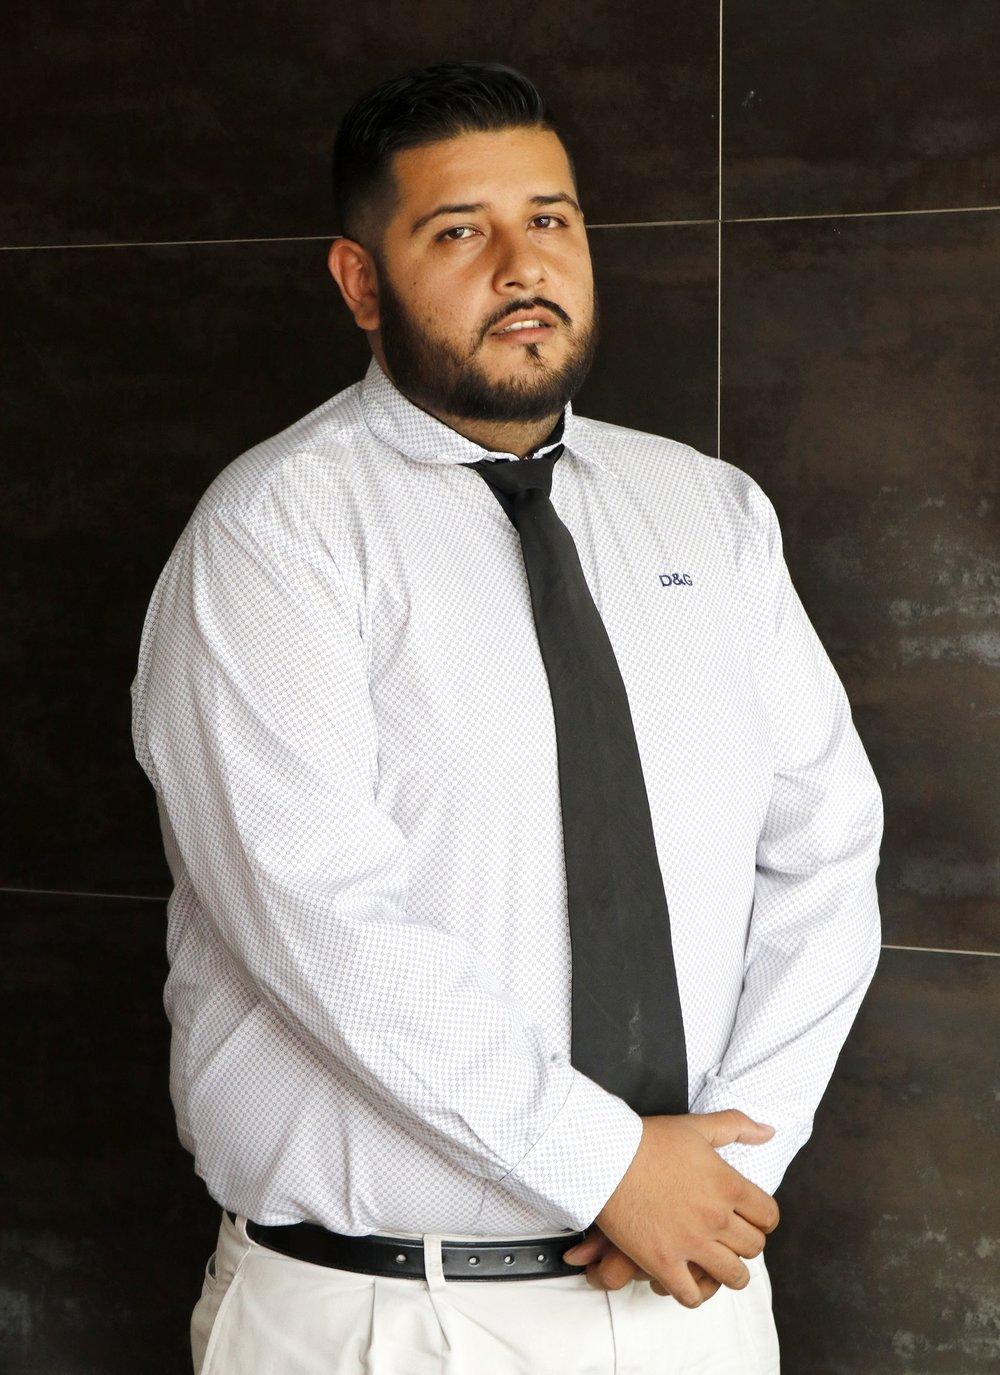 Jose Quality Control Manager